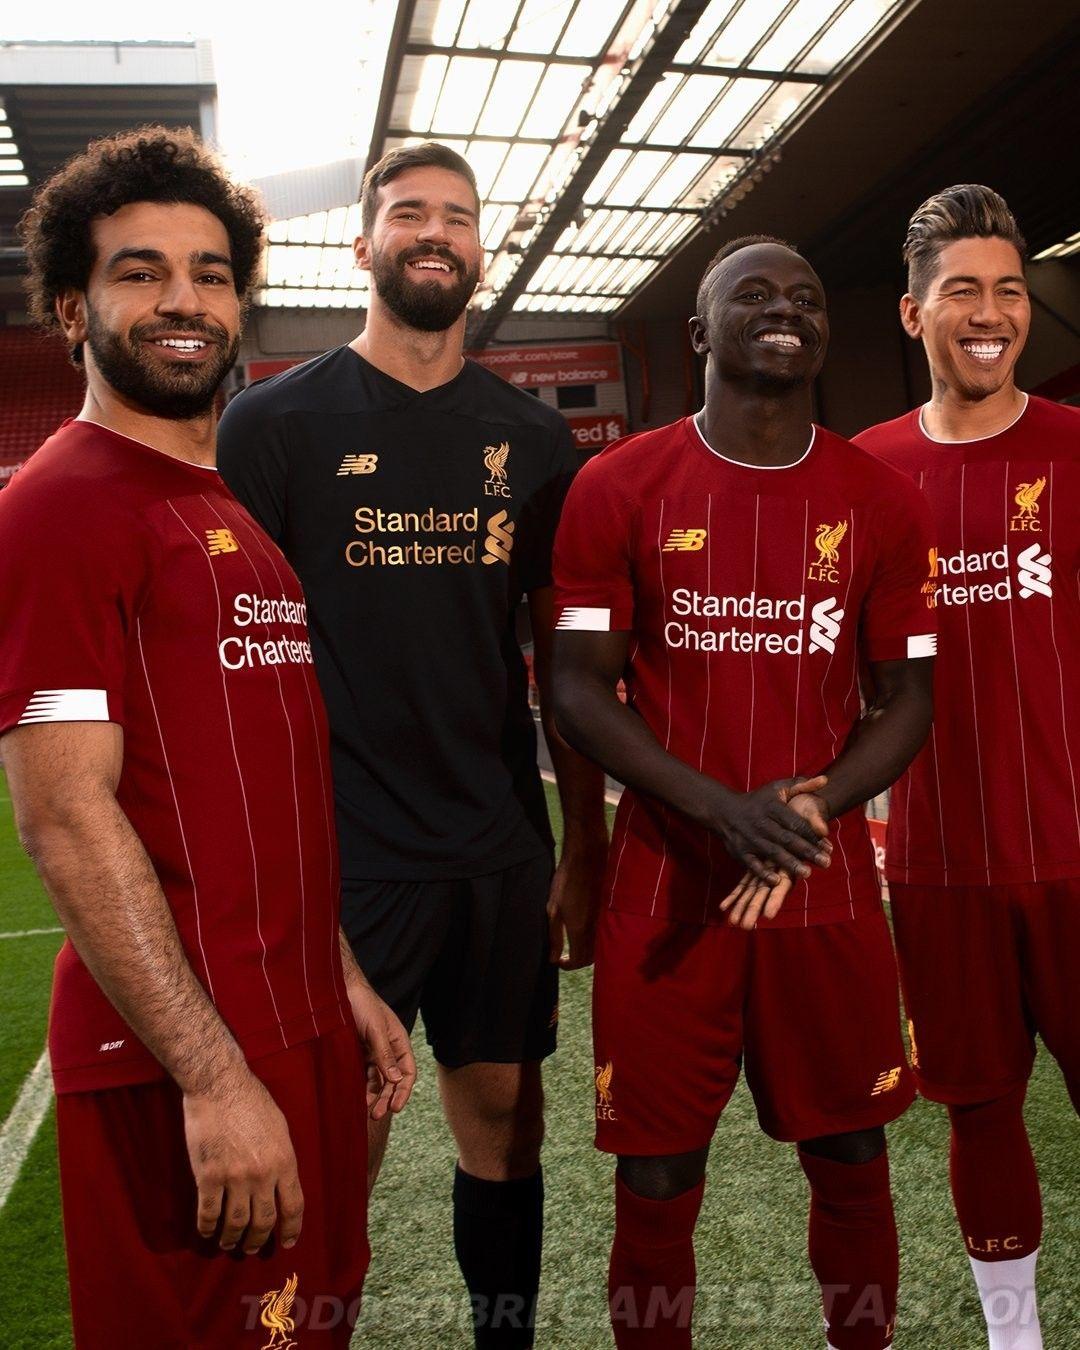 A3 Calendrier de Football Officiel Manchester City 2019